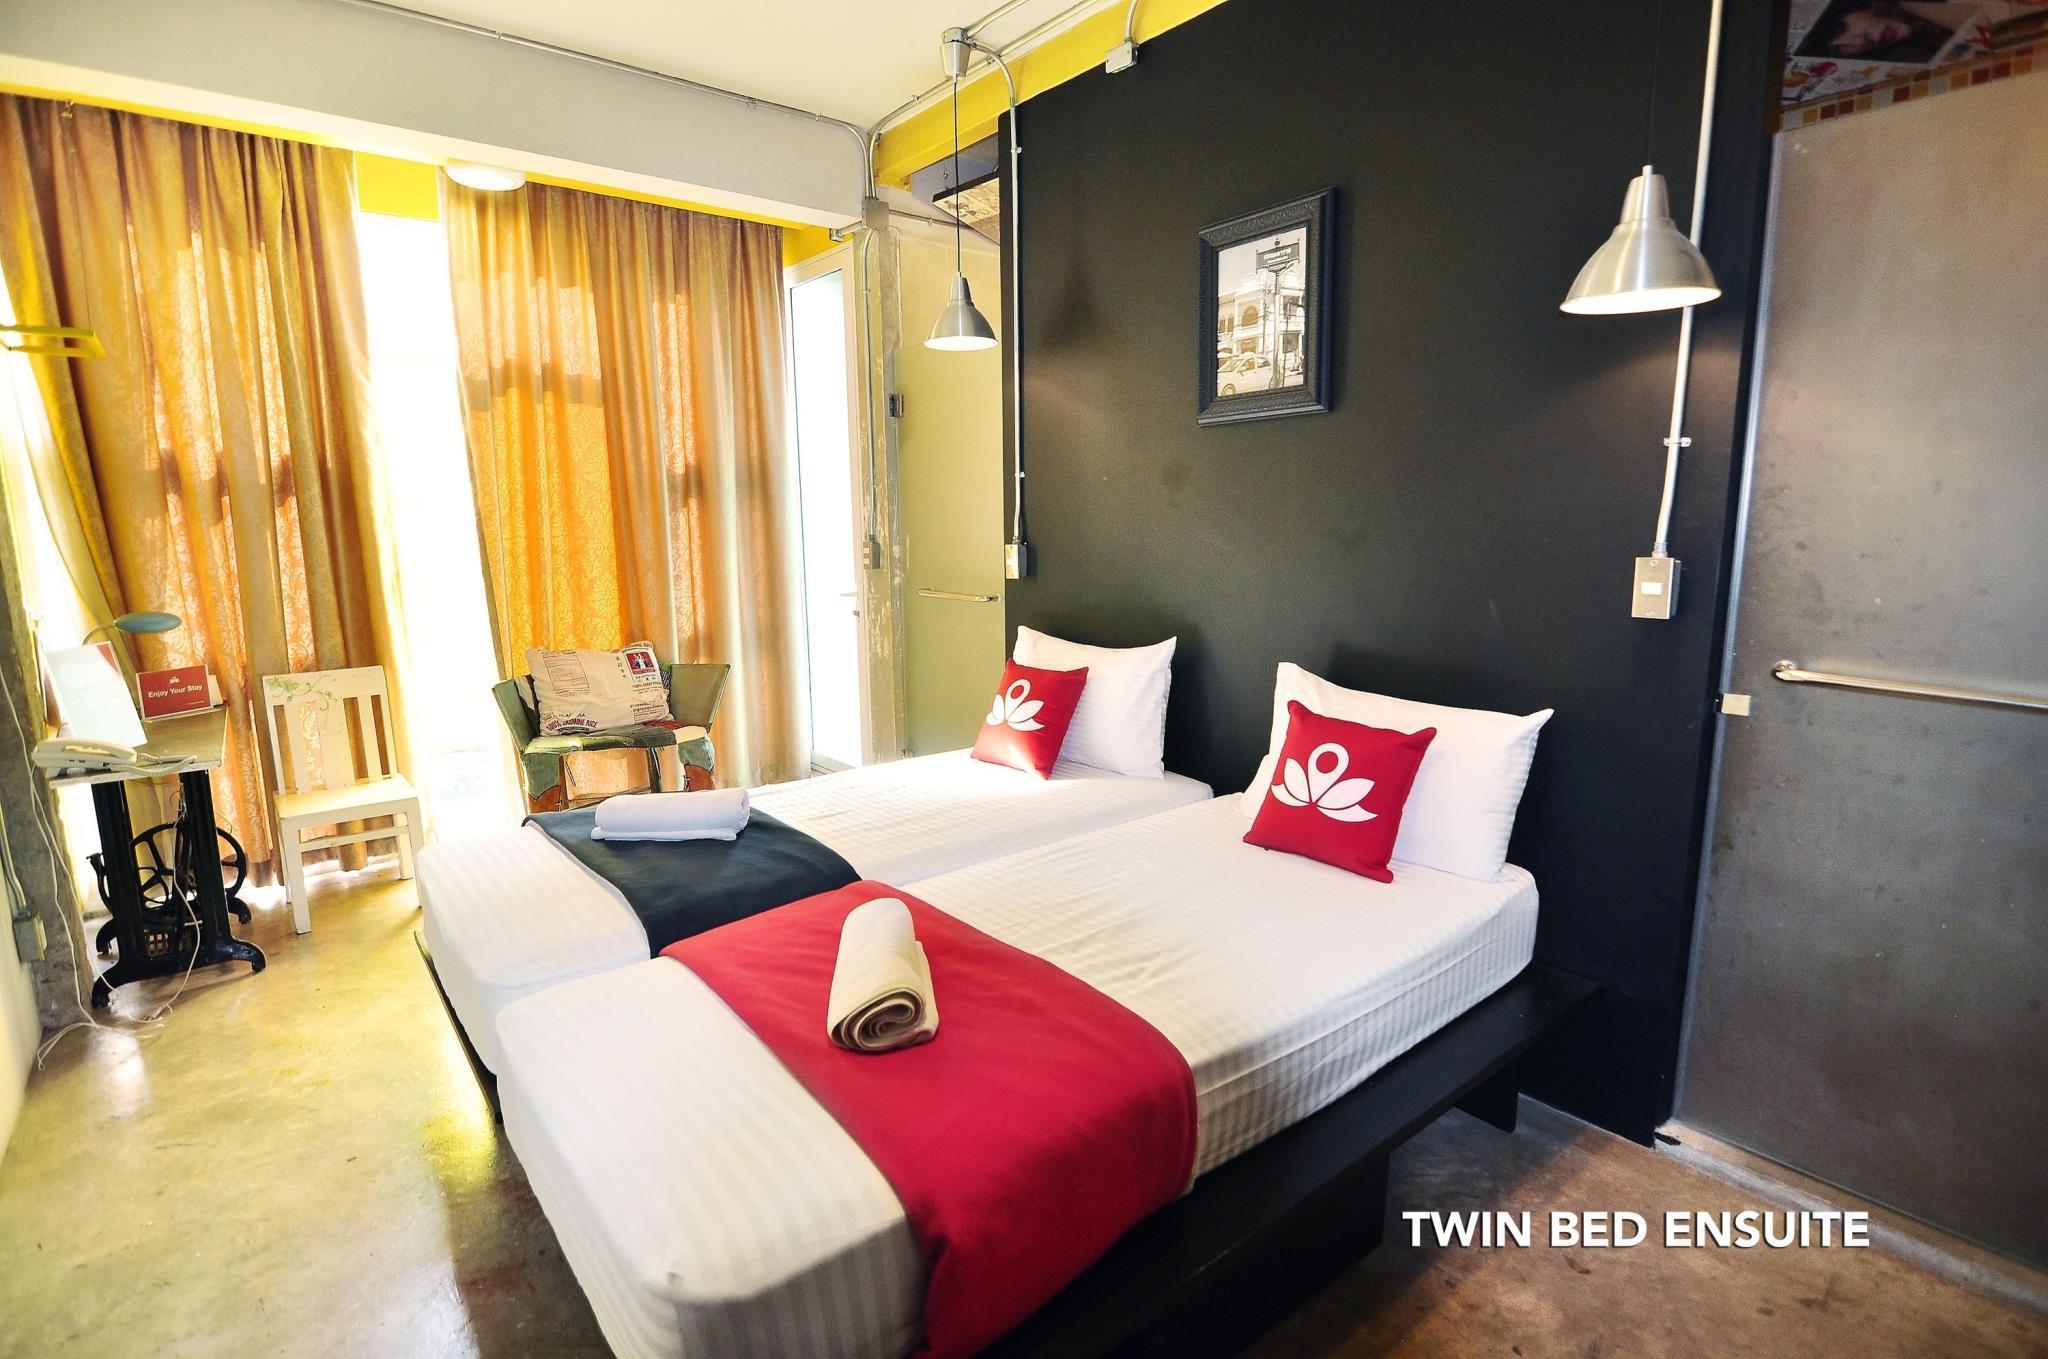 ZEN Hostel Silom 14, Bang Rak